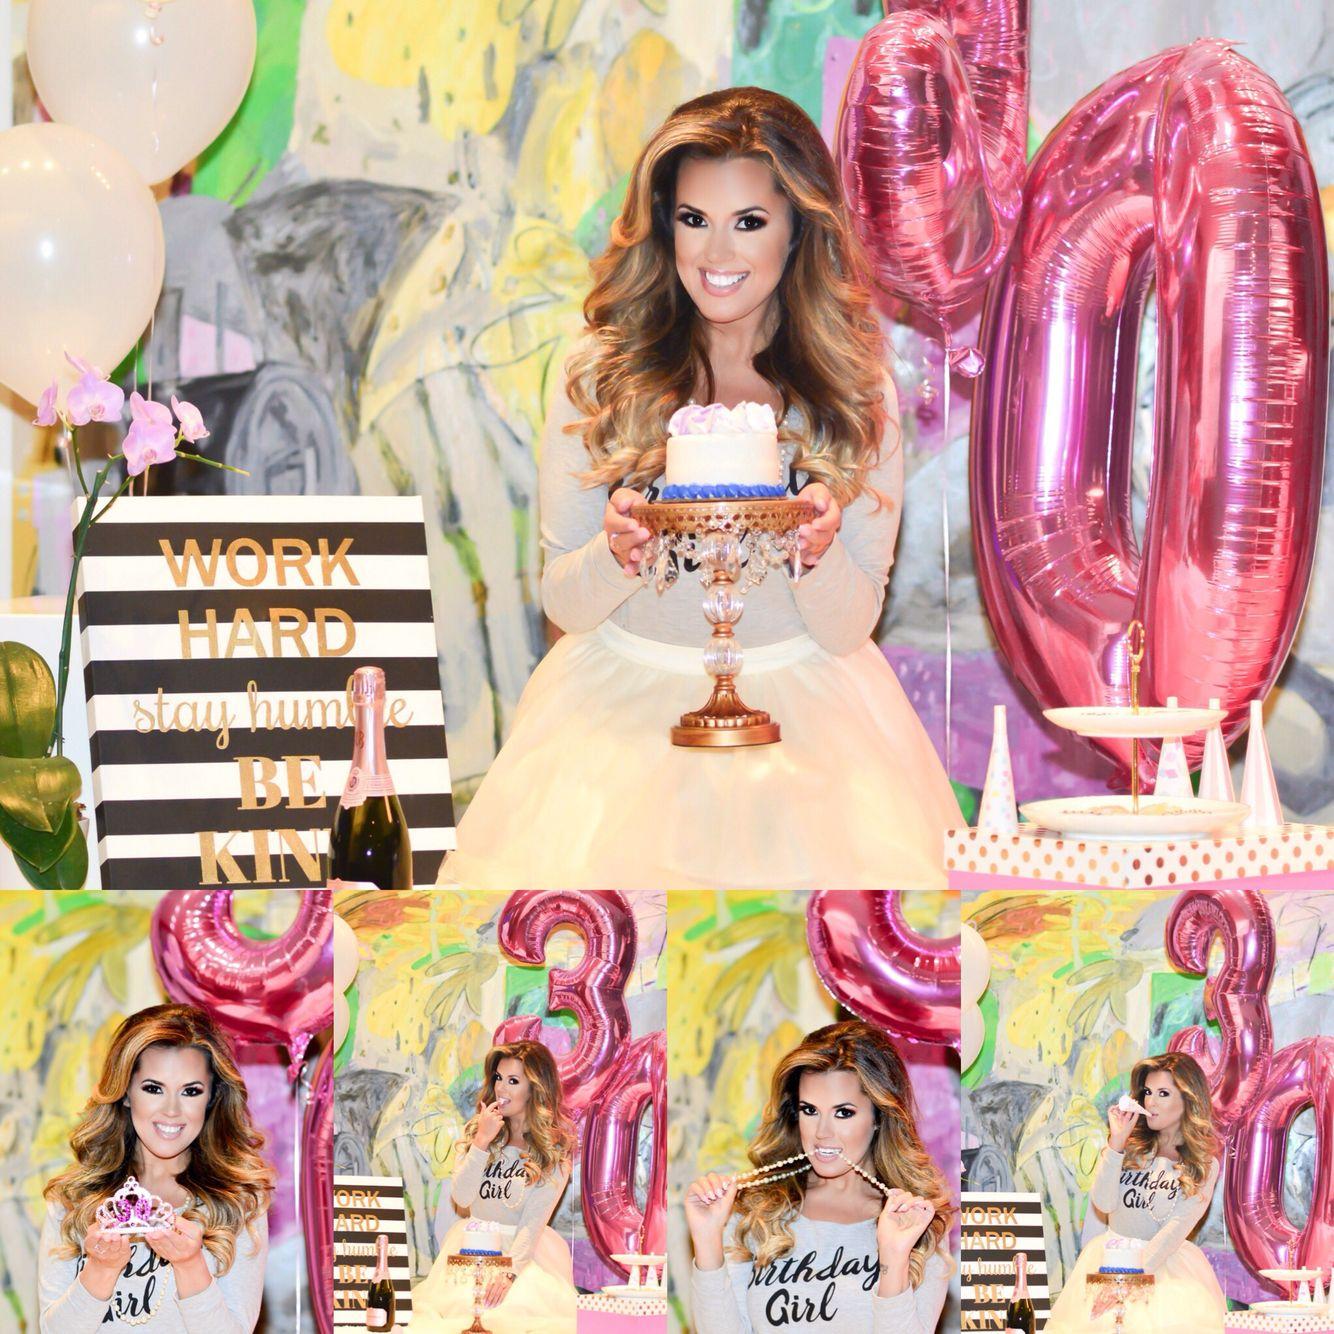 Fun 30th Birthday Idea Adult Cake Smash Funny Bday Cakesmash 40th 25th Glam Photoshoot